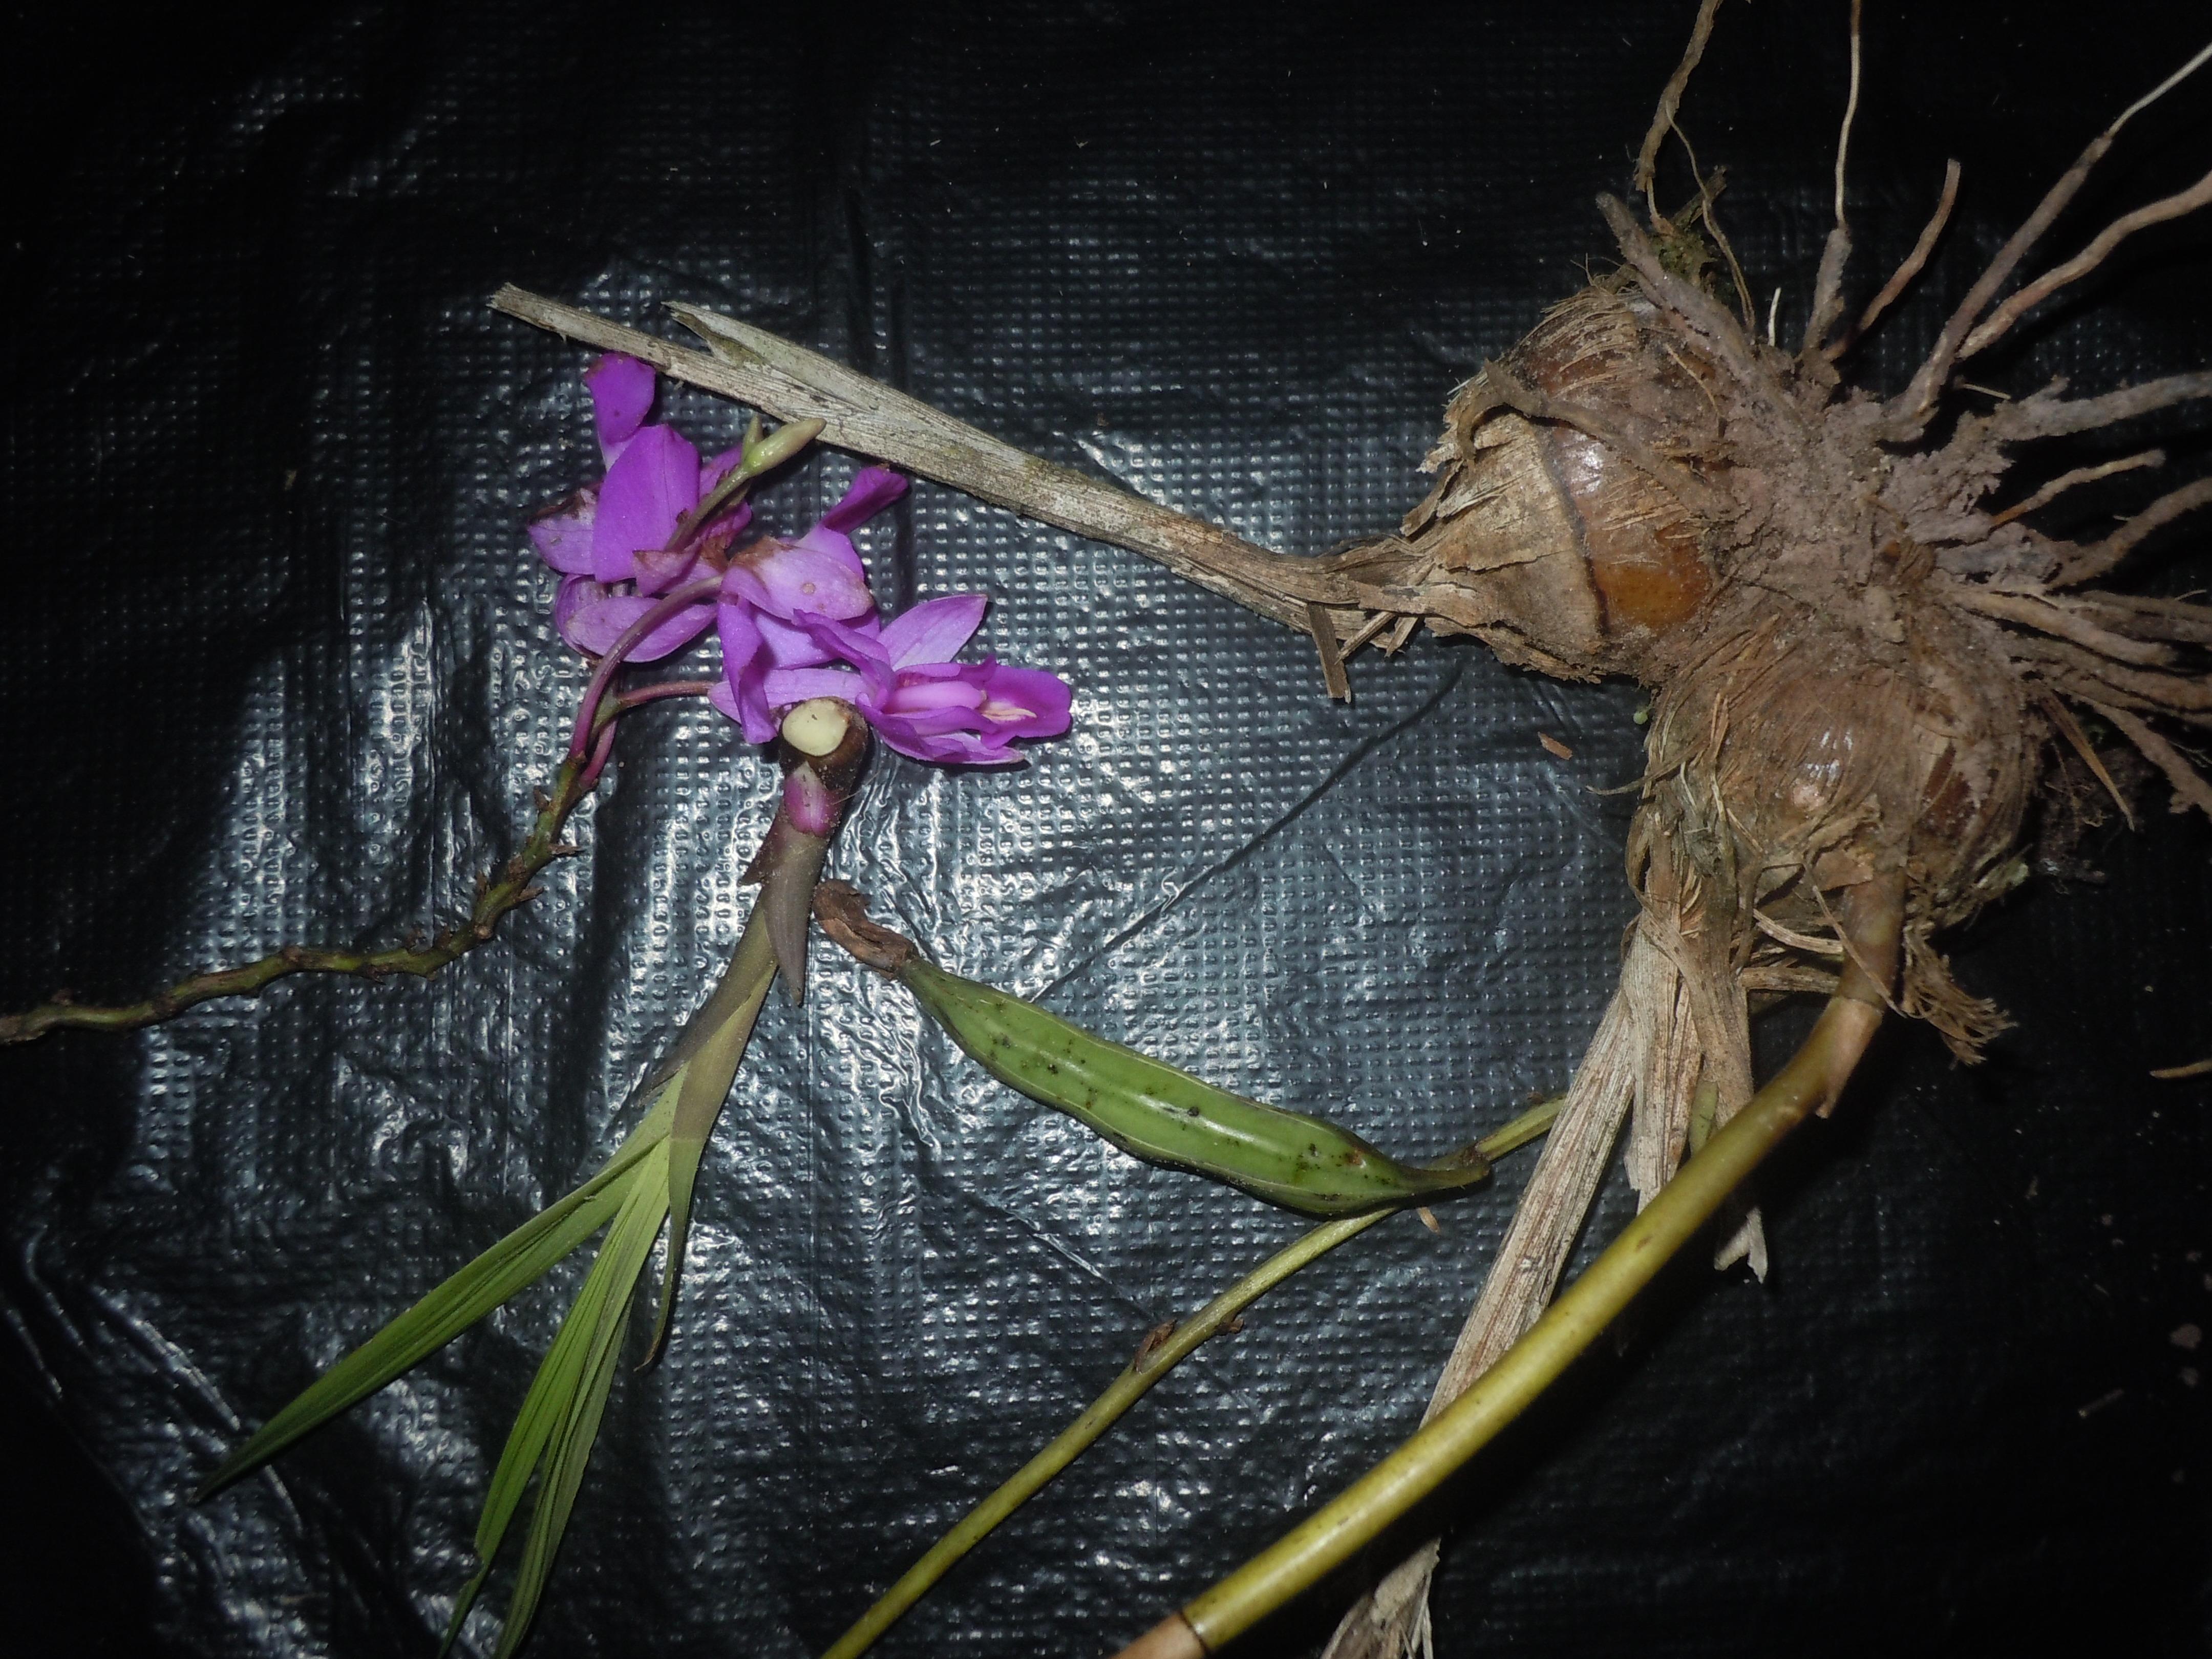 Espécimen: Bletia catenulata